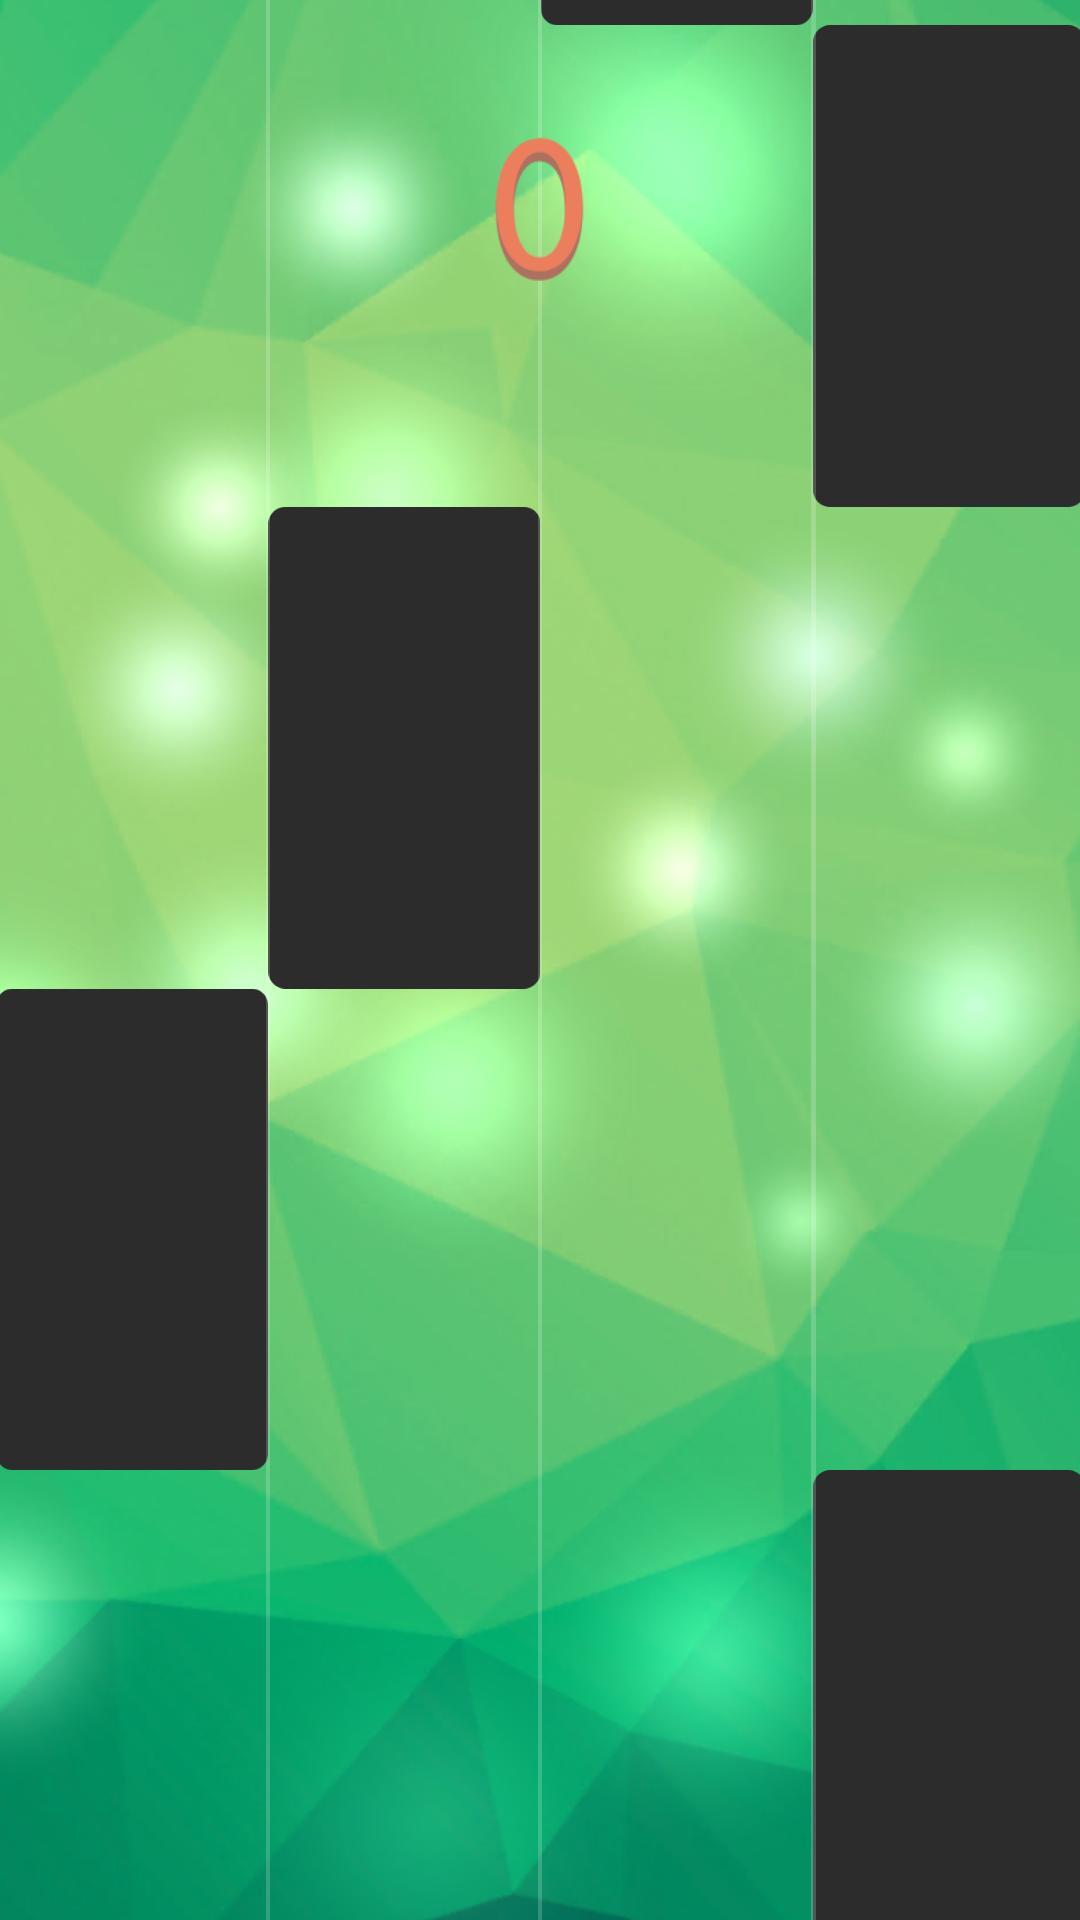 Jessie J - Flashlight - Lyrics Piano Tap for Android - APK Download